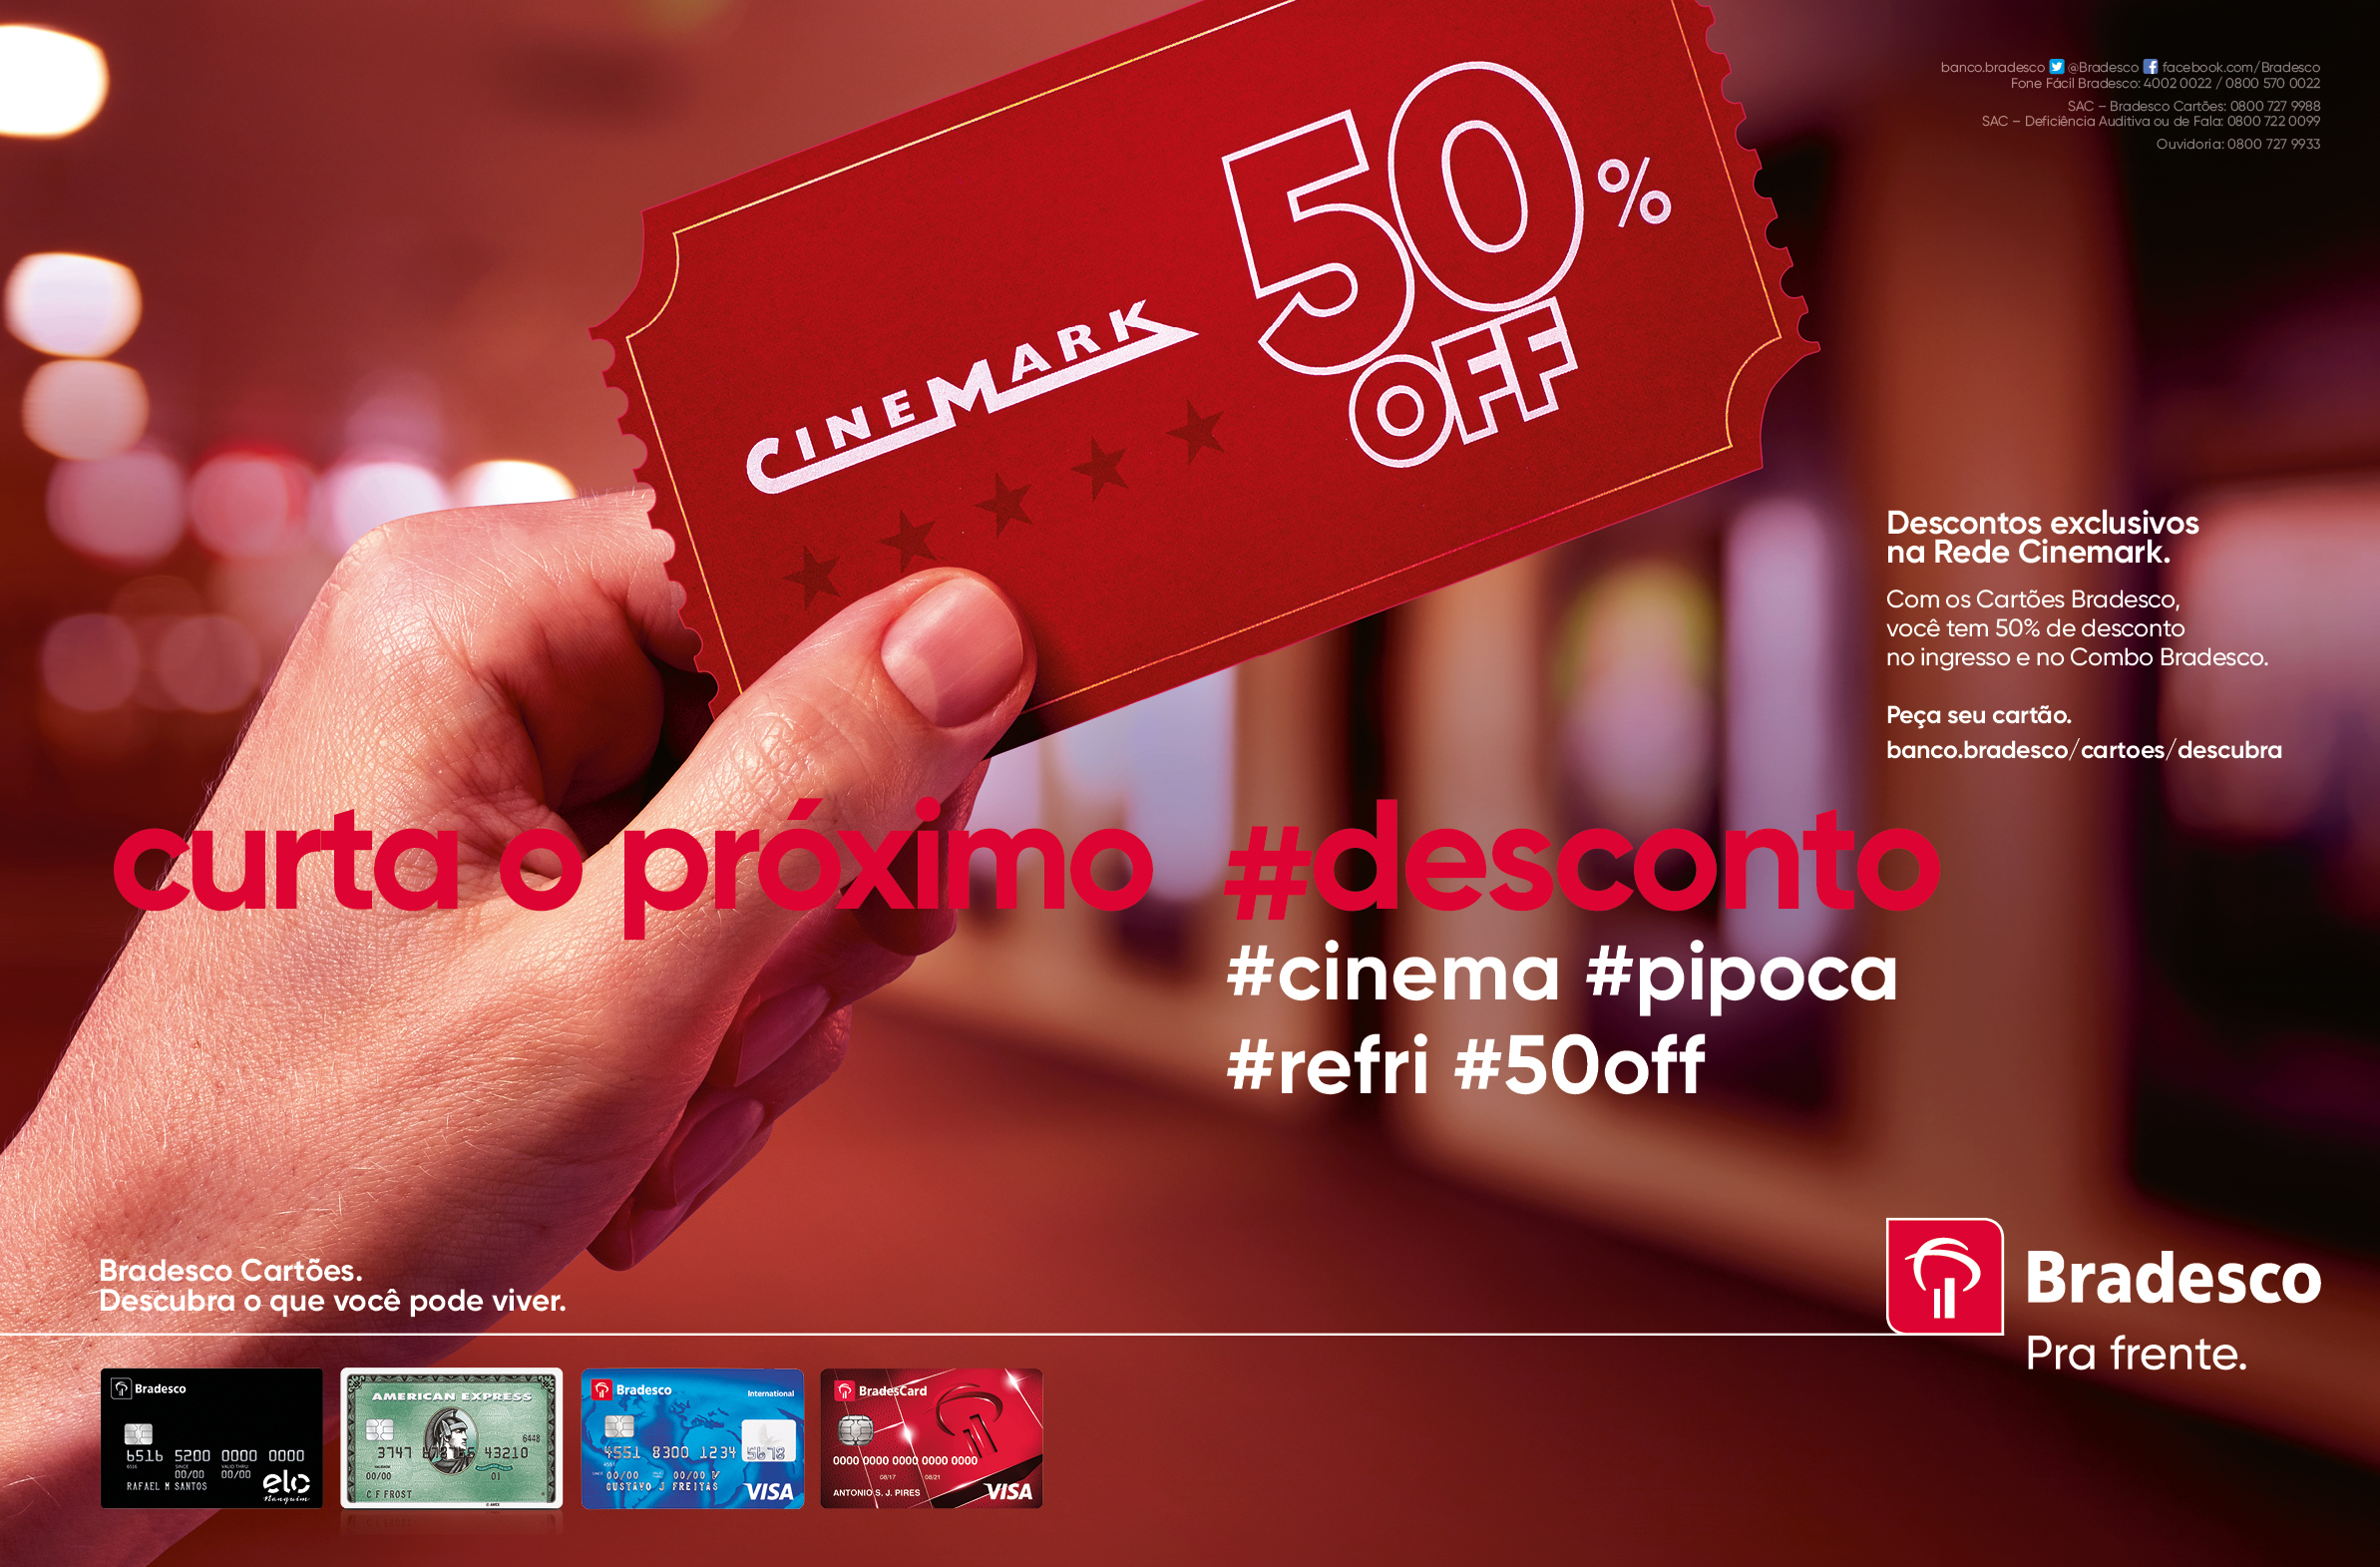 Copy:  Enjoy the next discount. #cinema #popcorn #soda #50%off